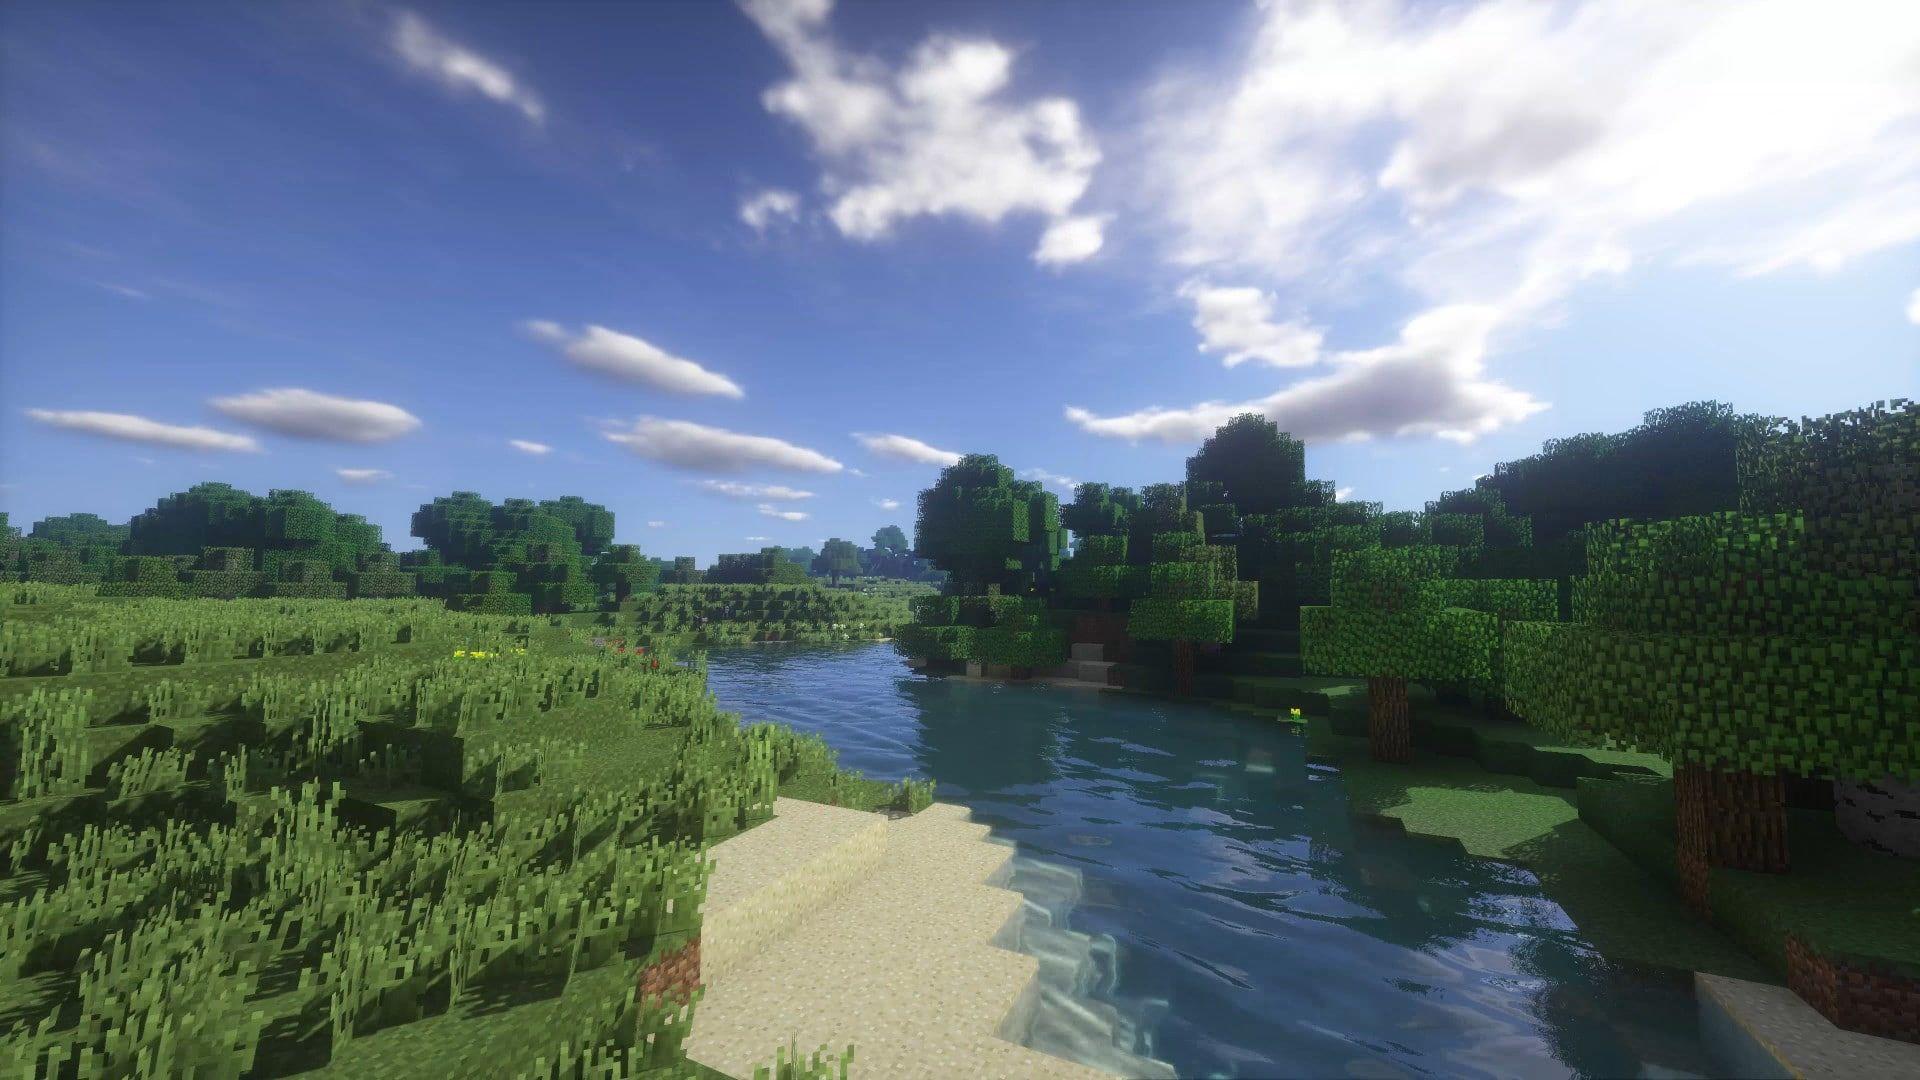 Landscape Minecraft Shaders 1080p Wallpaper Hdwallpaper Desktop In 2020 Minecraft Shaders Minecraft Wallpaper Desktop Wallpaper